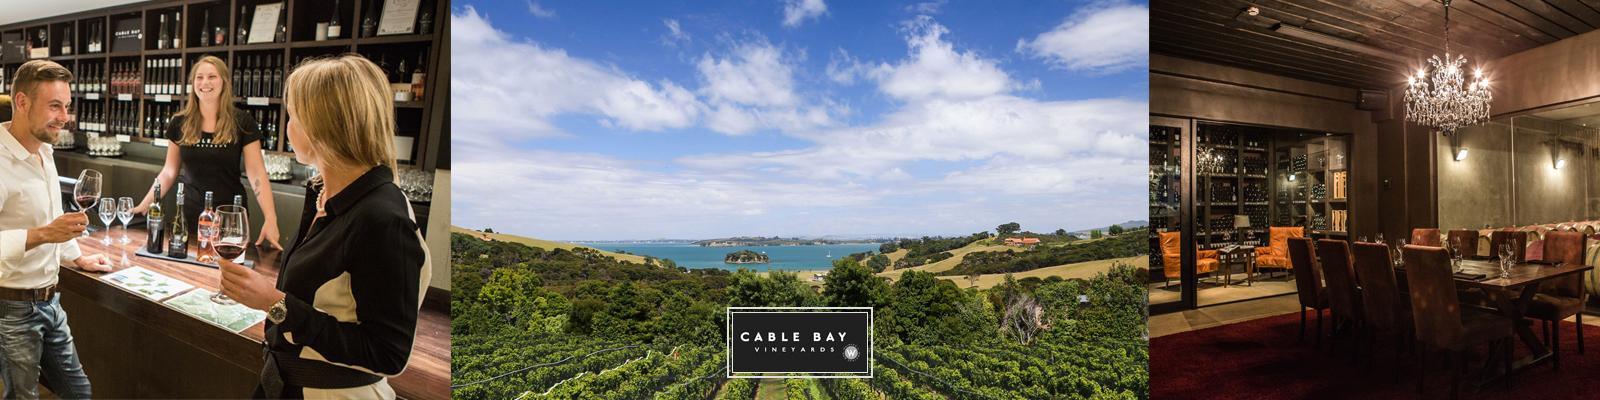 banner-cable-bay-vineyards.jpg